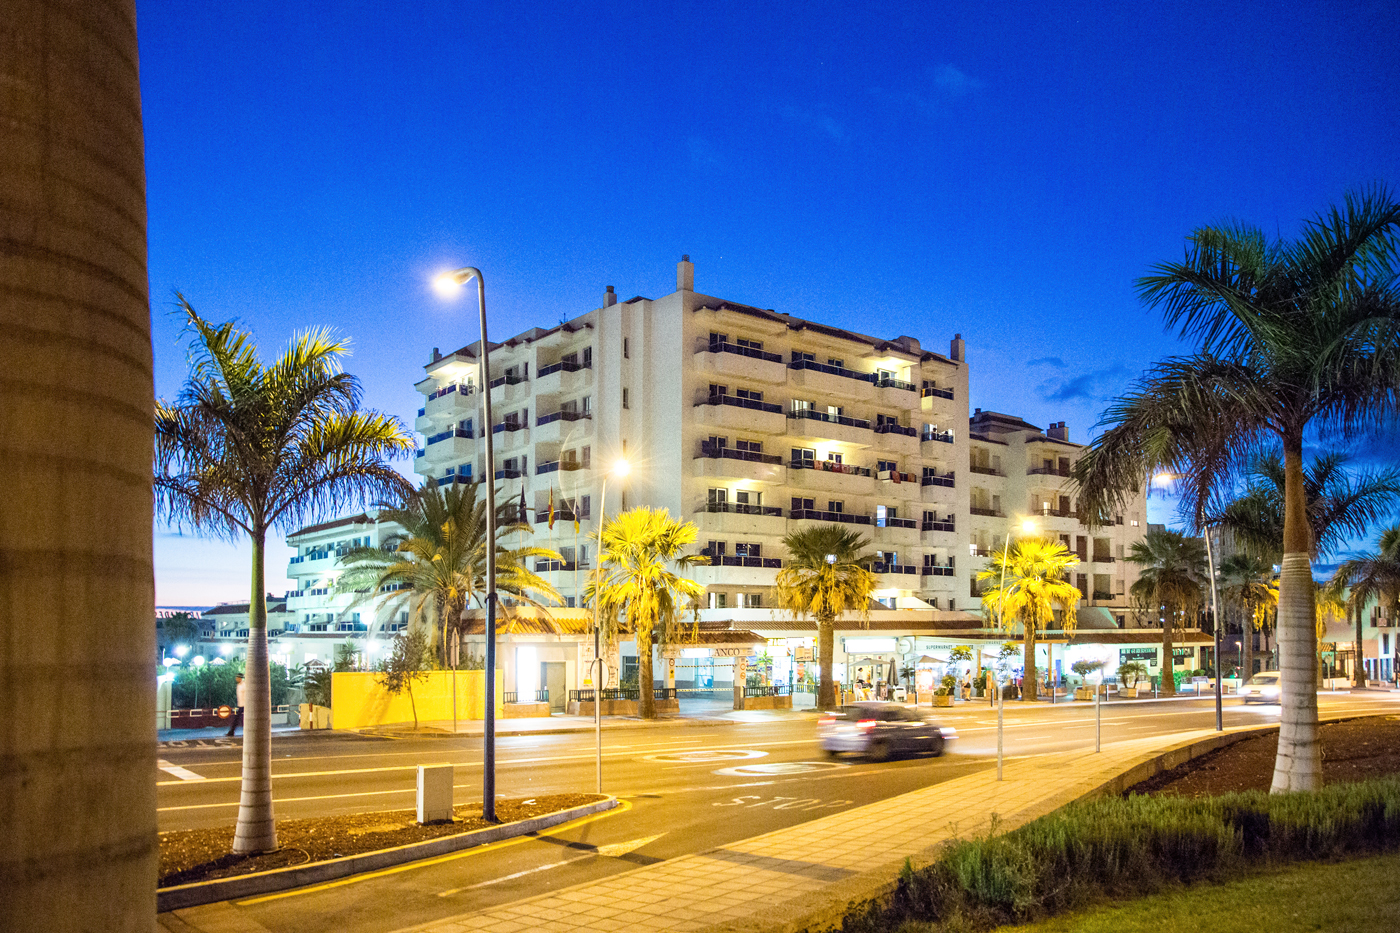 Apartamentos oro blanco tenerife best price online for Apartamentos